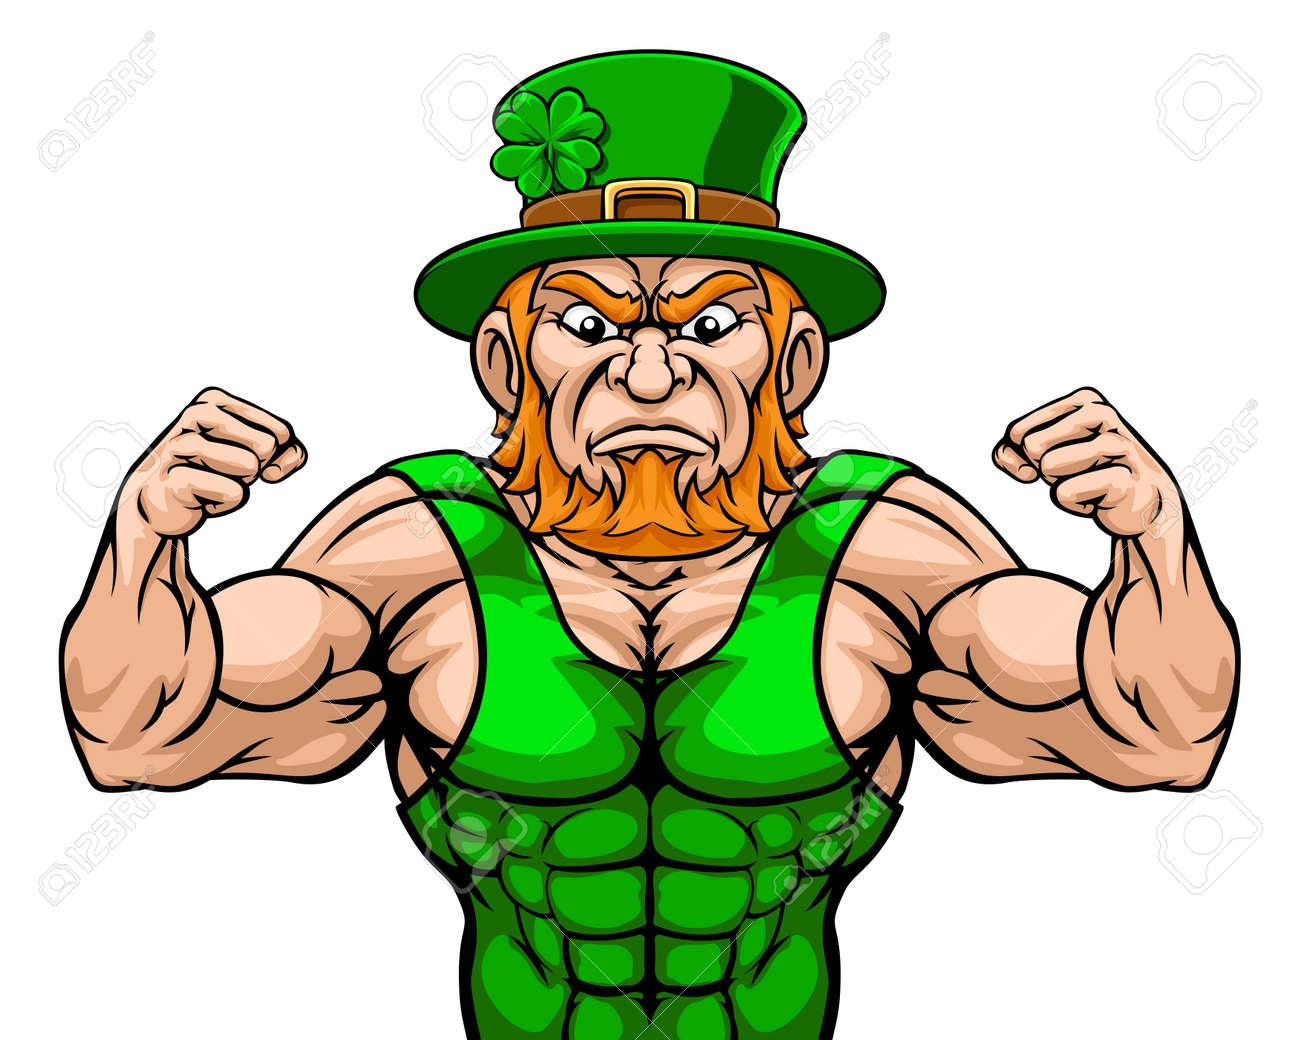 Leprechaun Sports Mascot Cartoon Character - 120675018